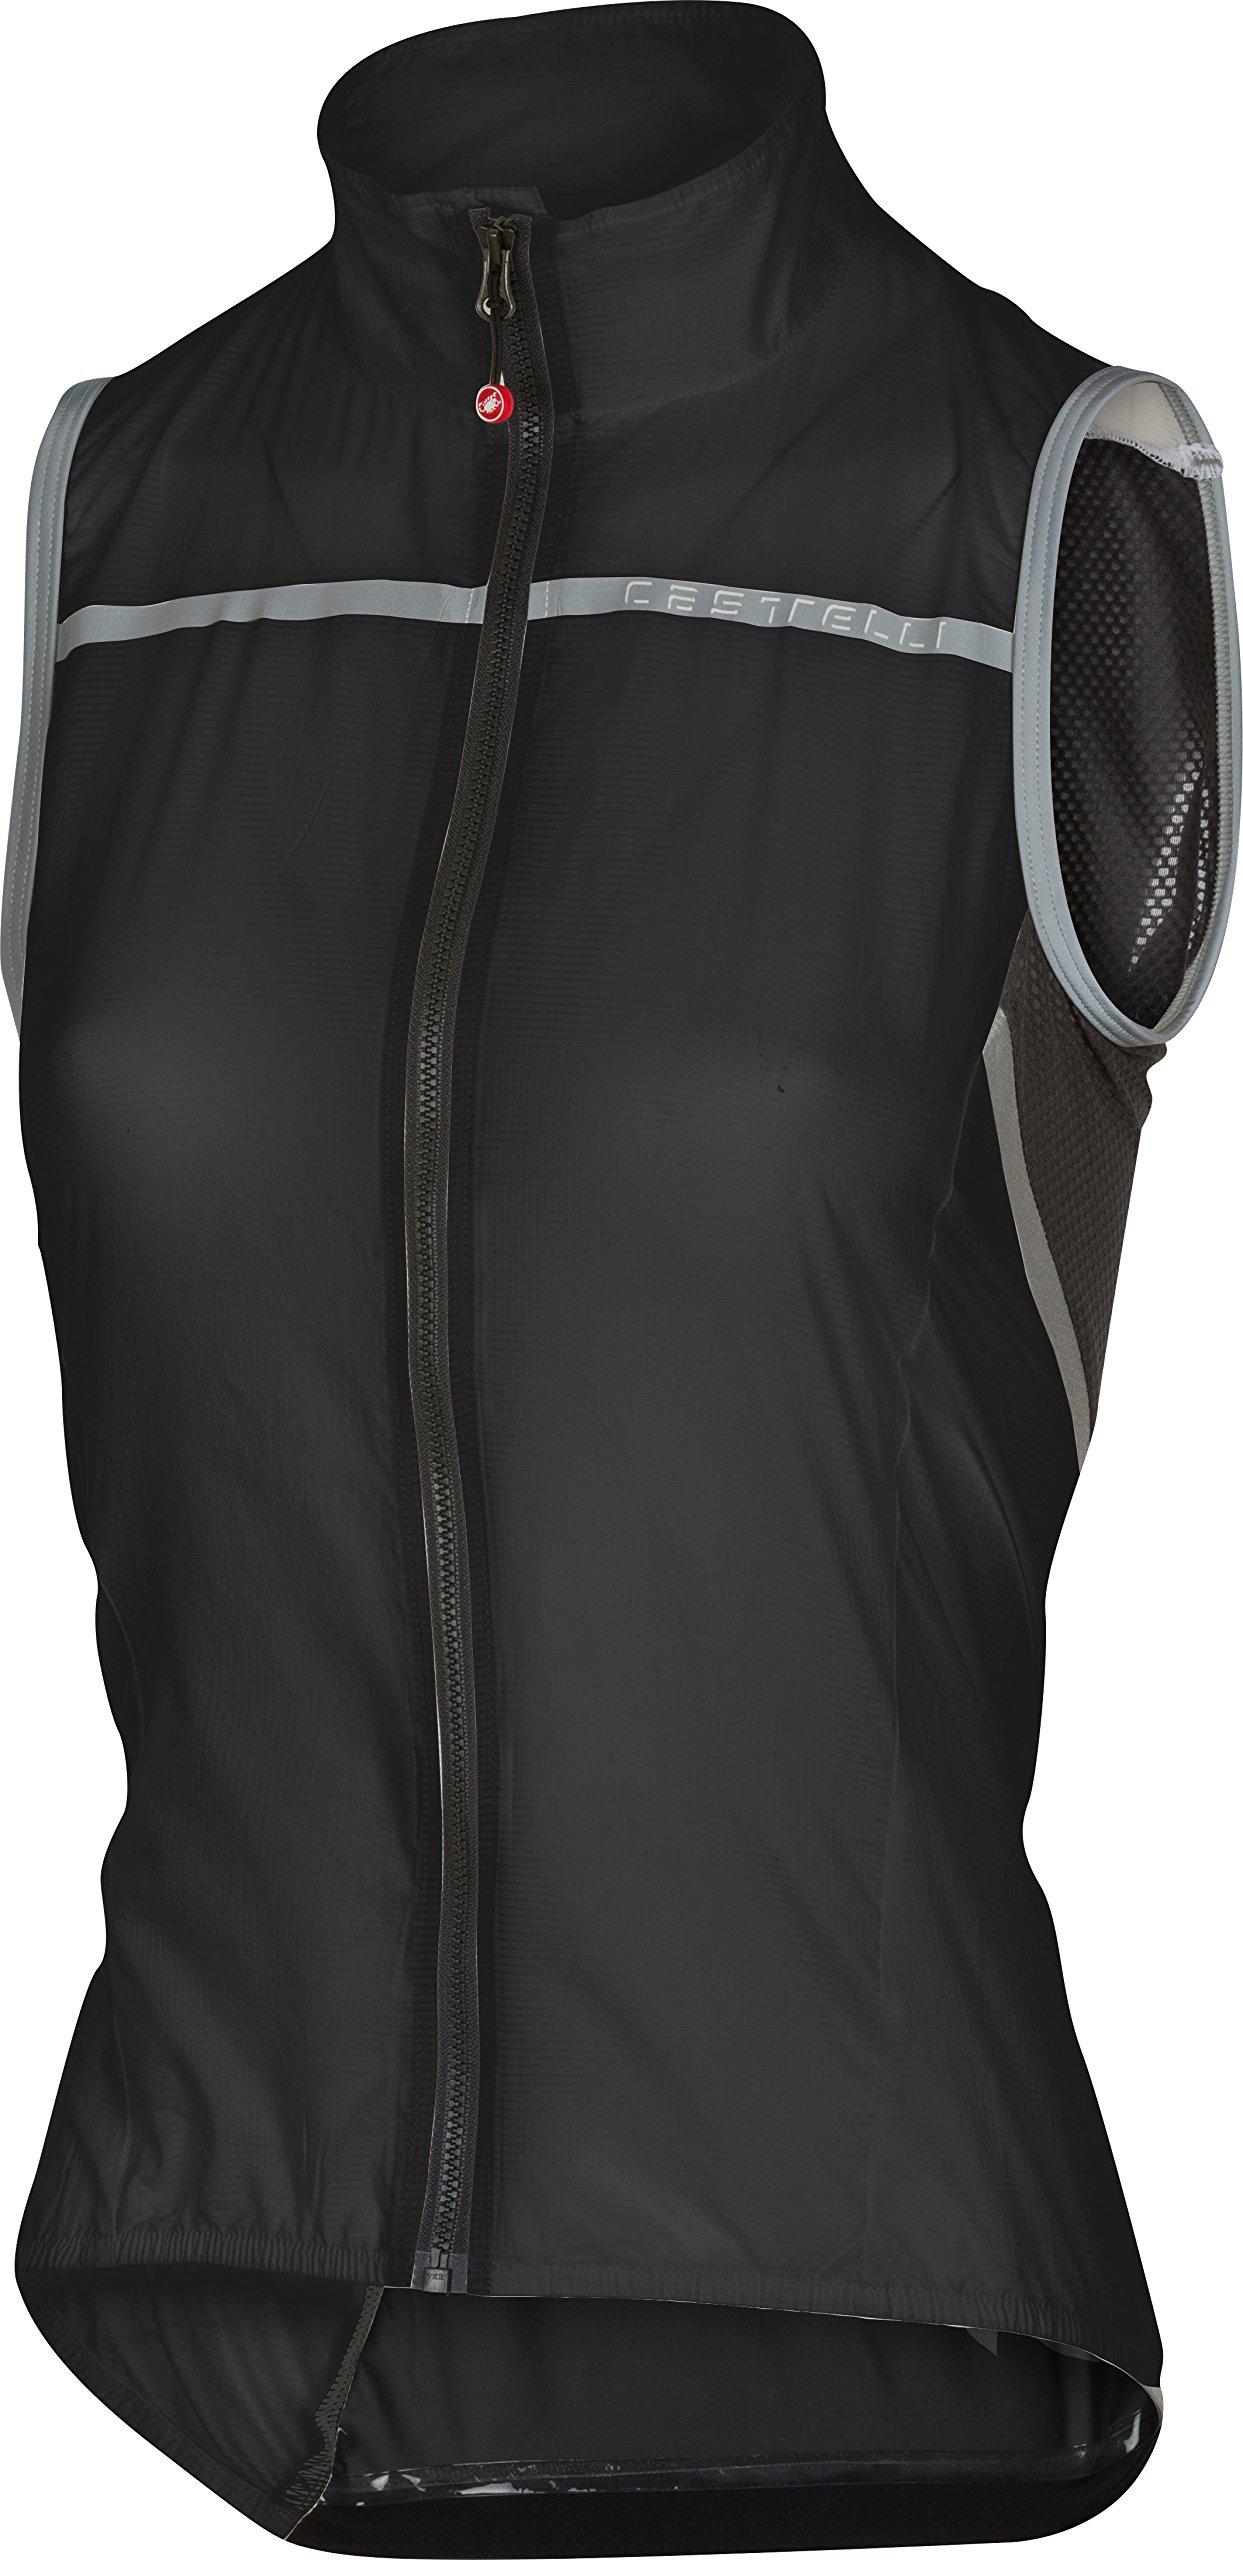 Castelli Superleggera Vest - Women's Black, L